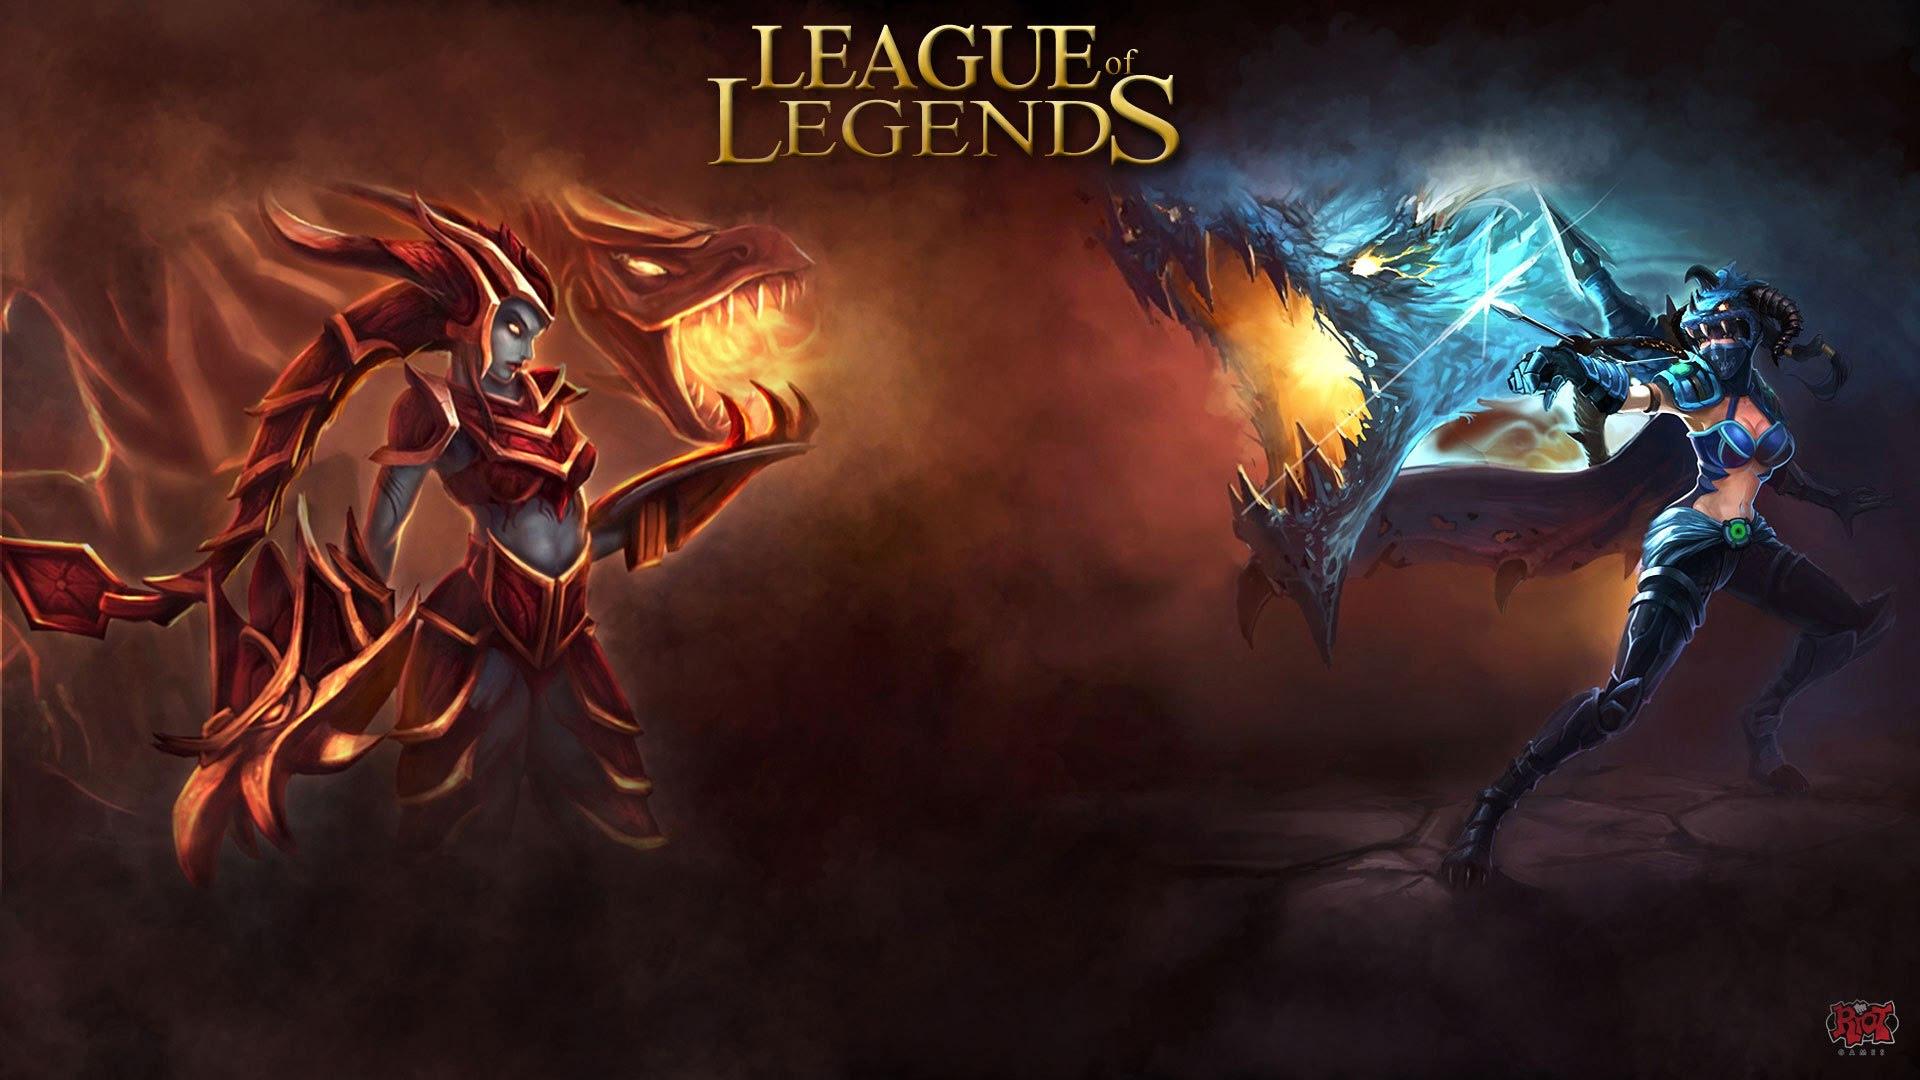 http://img3.wikia.nocookie.net/__cb20130904214649/leagueoflegends/es/images/f/f9/League-of-Legends-Wallpaper-1920x1080-42374.jpg